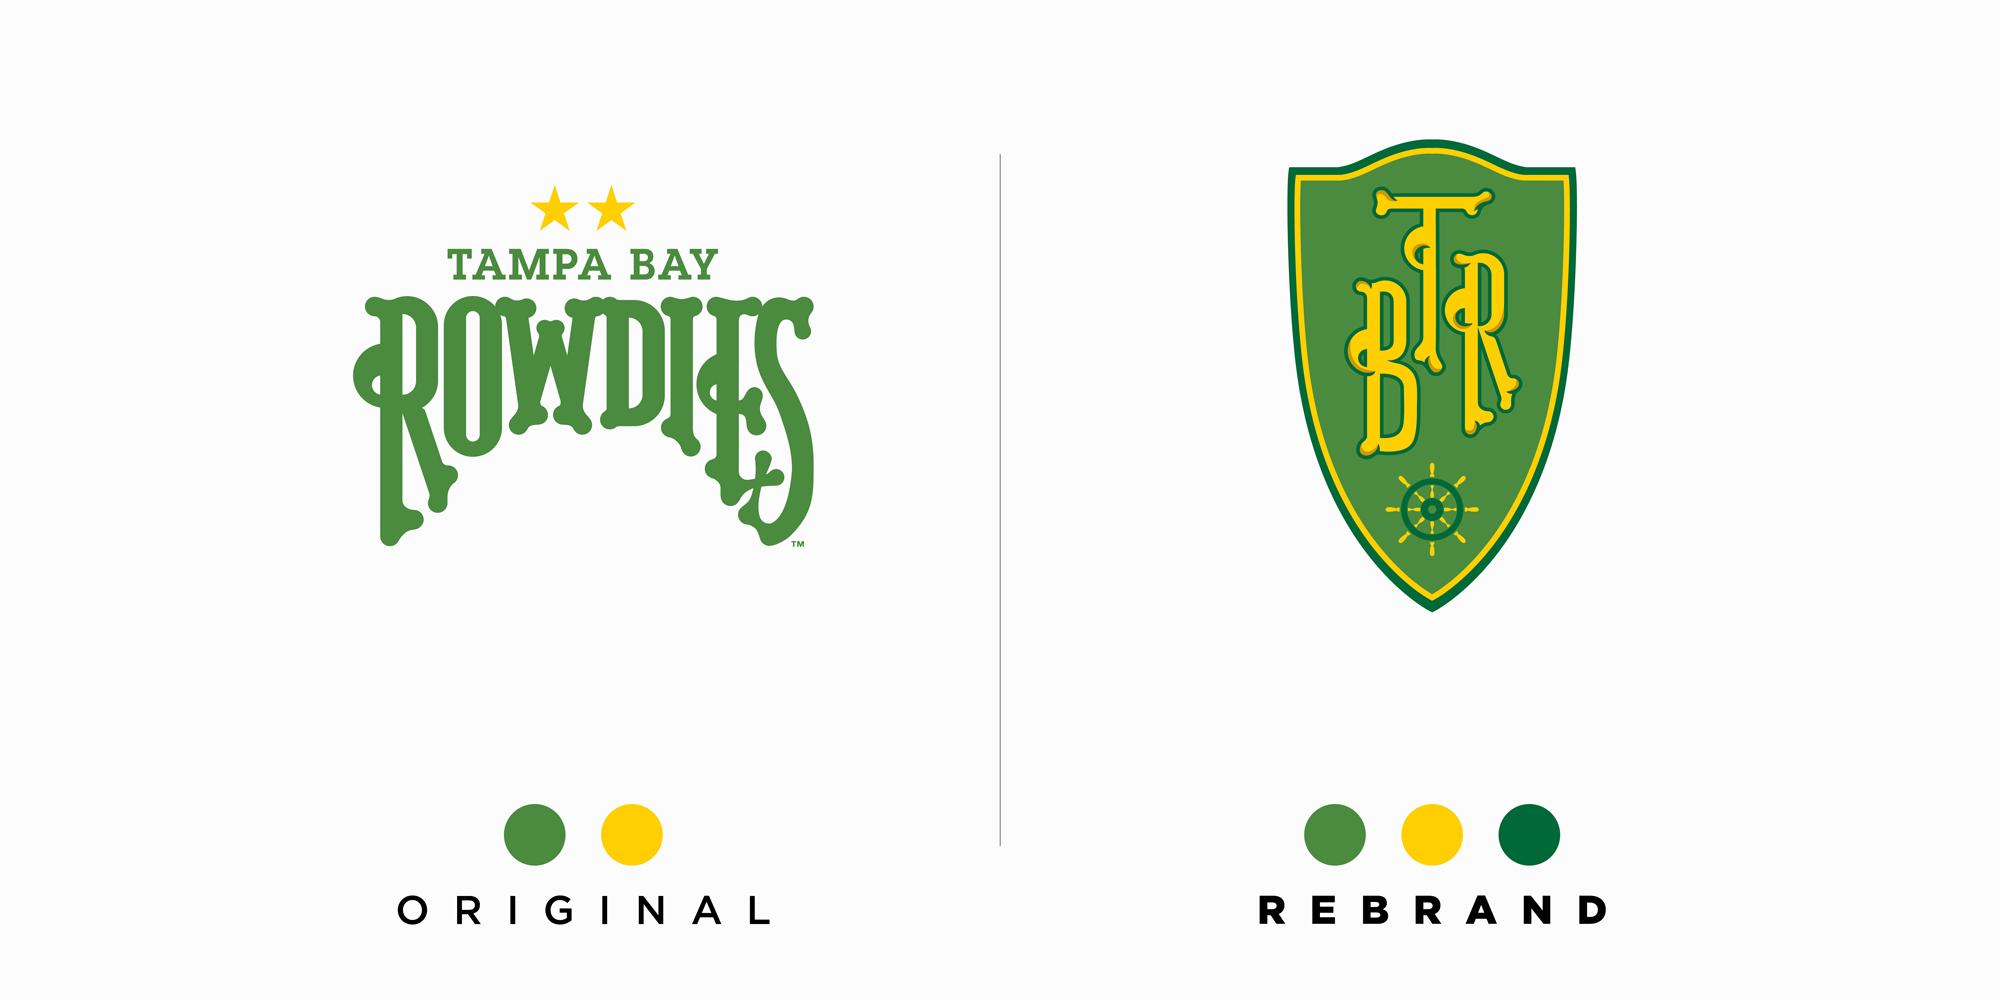 Tampa-Bay-Rowdies-Blog-Art8.jpg